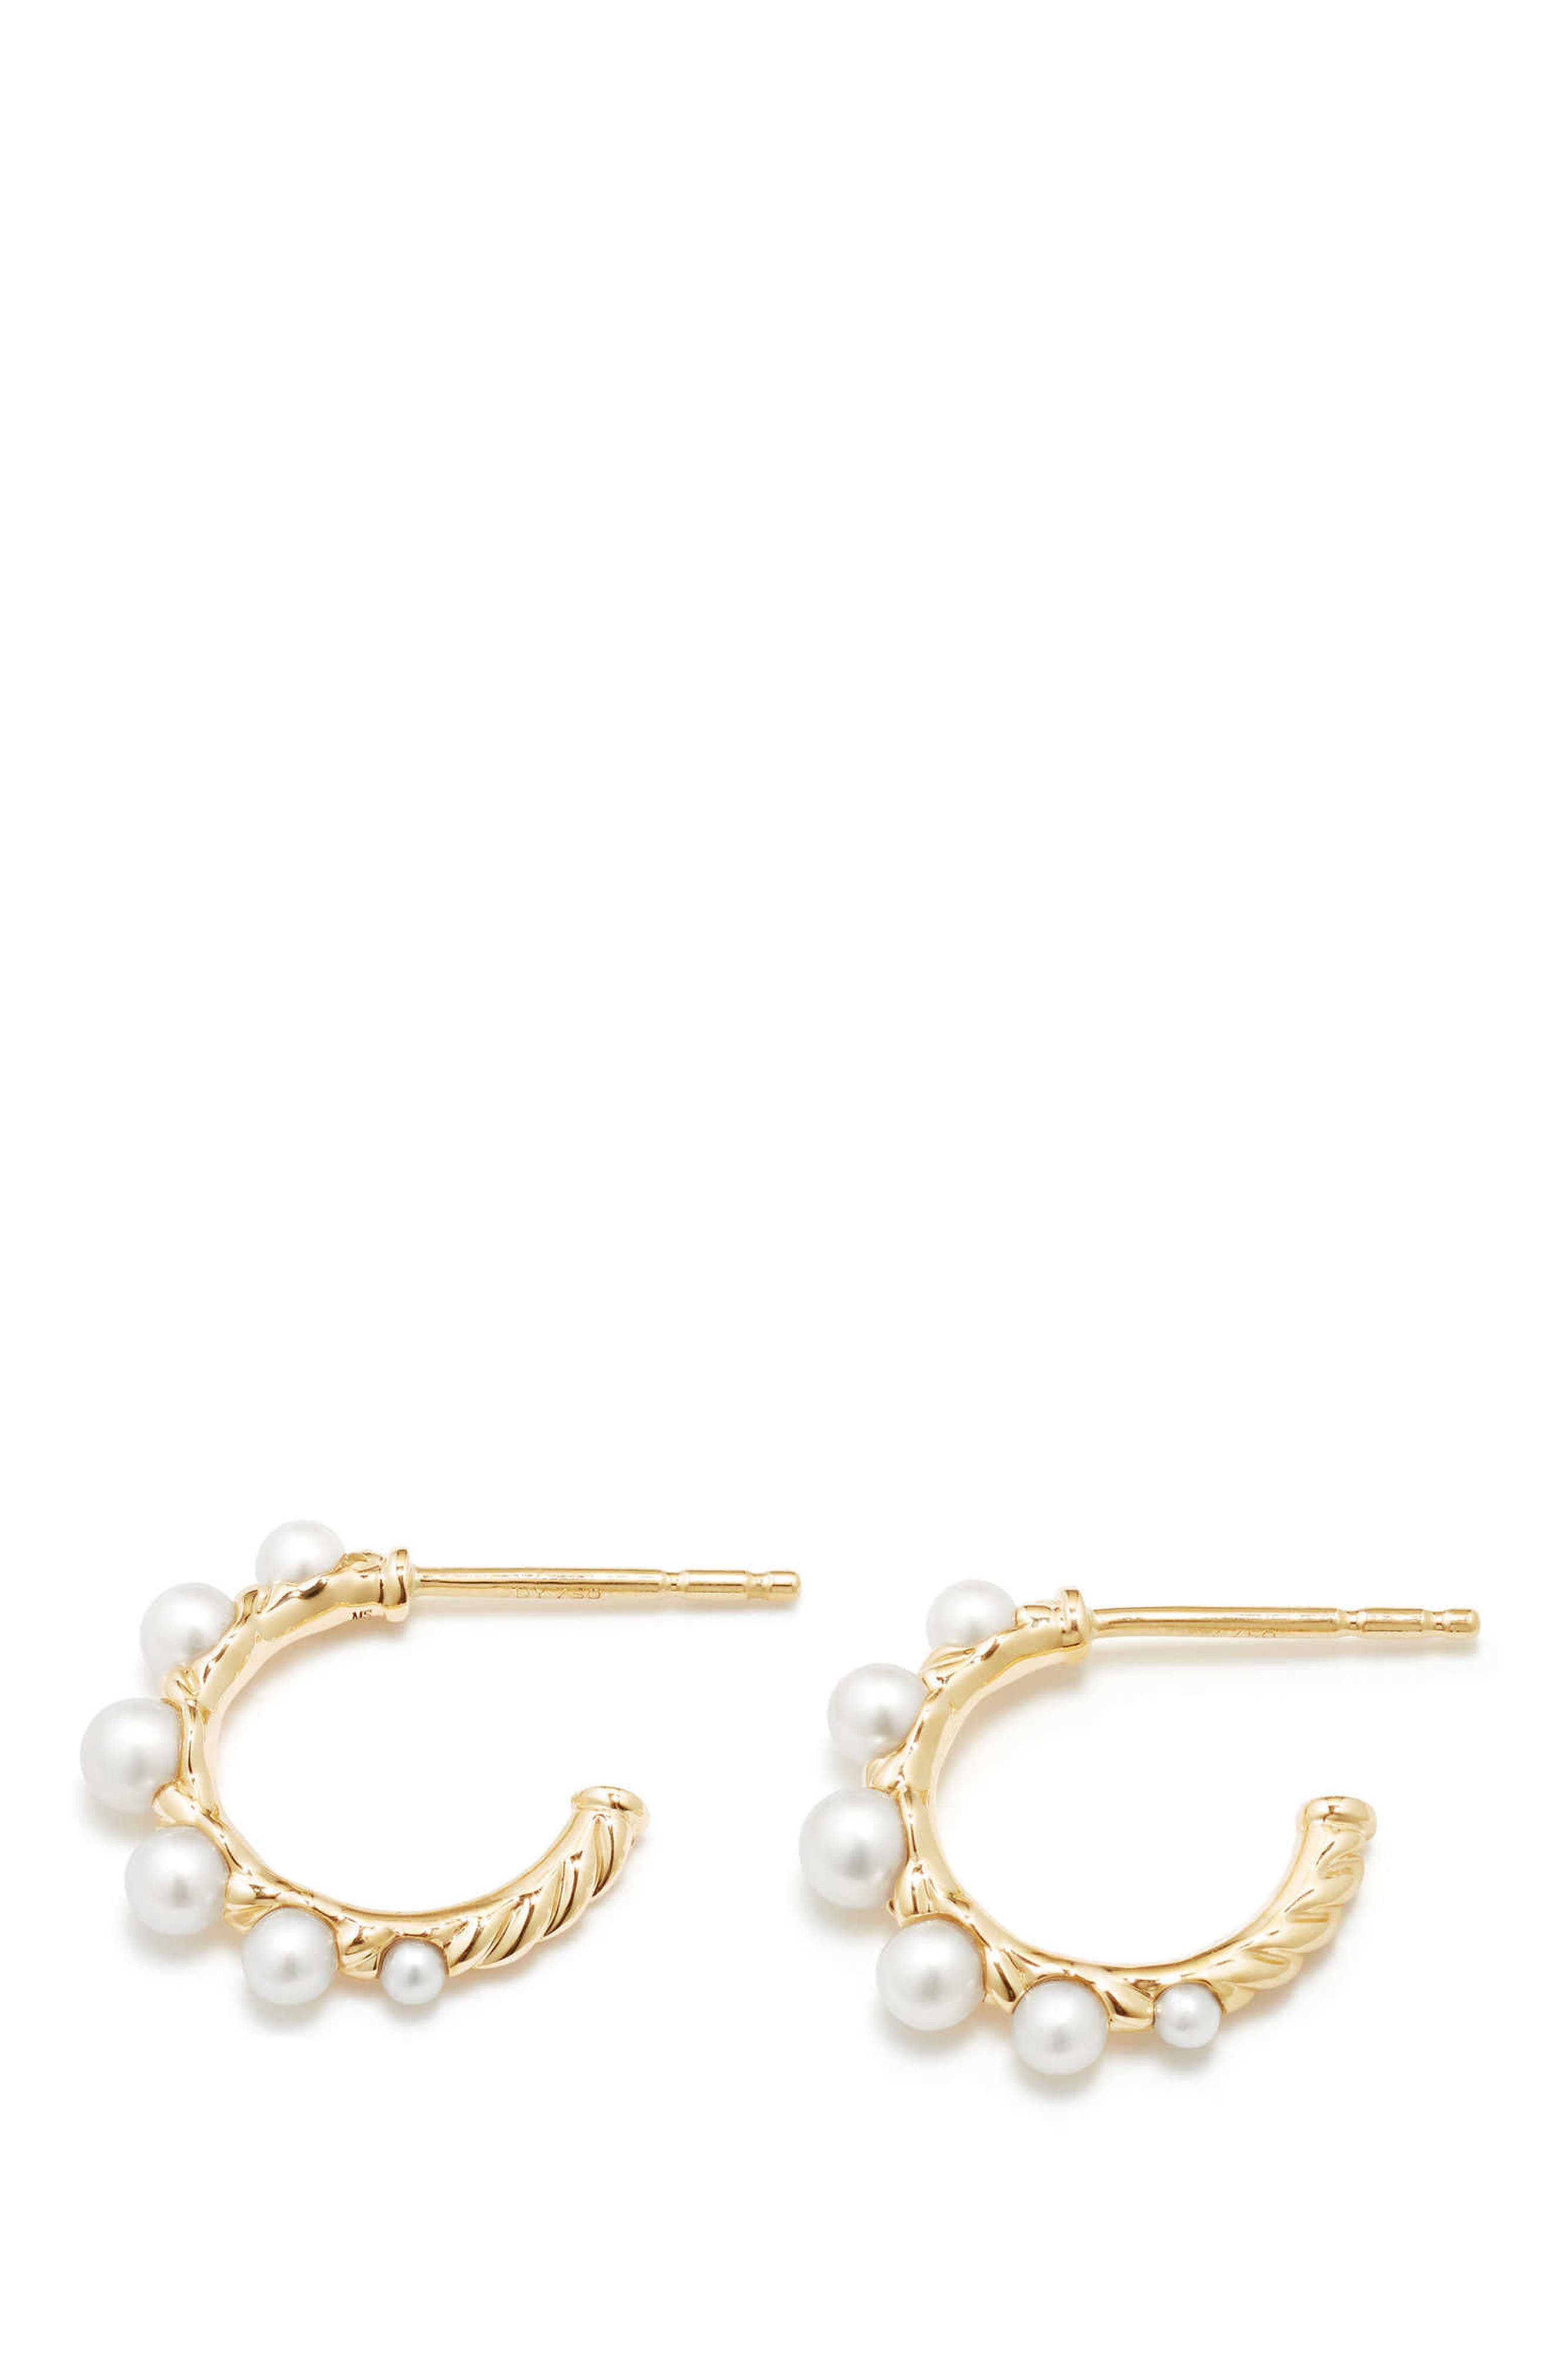 Petite Perle Graduated Pearl Hoop Earrings in 18K Gold,                         Main,                         color, GOLD/ PEARL